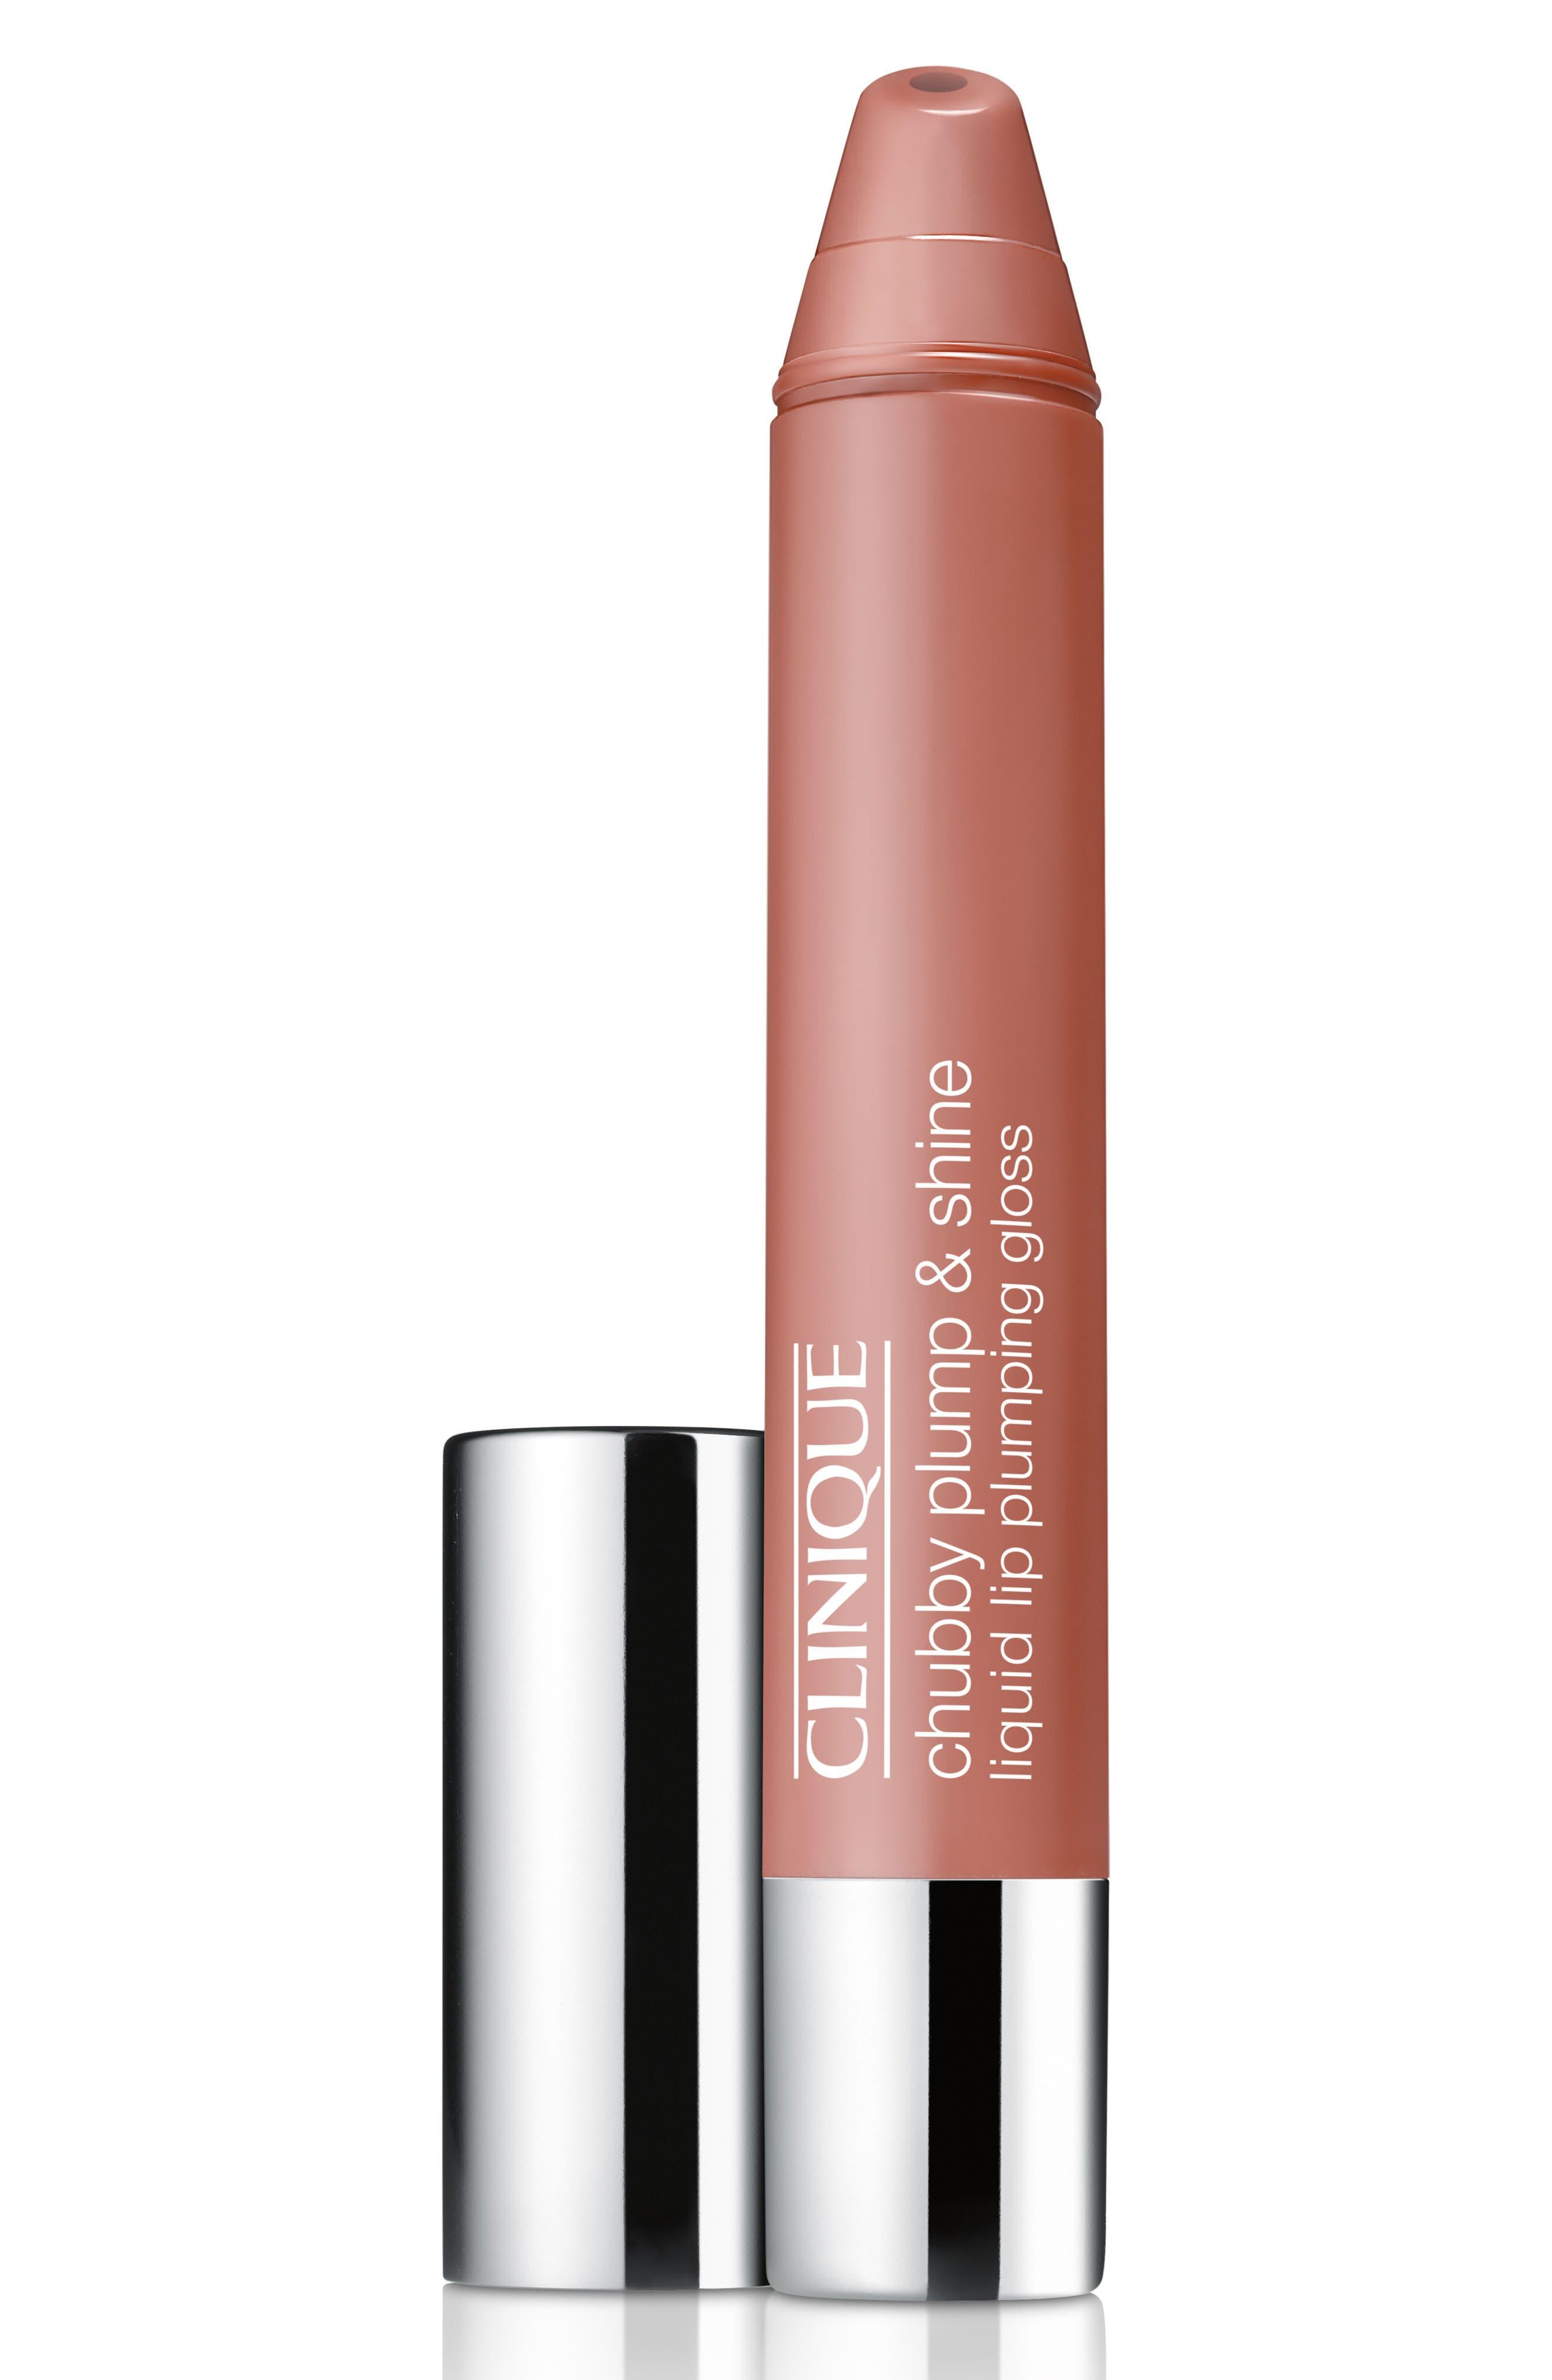 Chubby Plump & Shine Liquid Lip Plumping Gloss,                         Main,                         color, 250